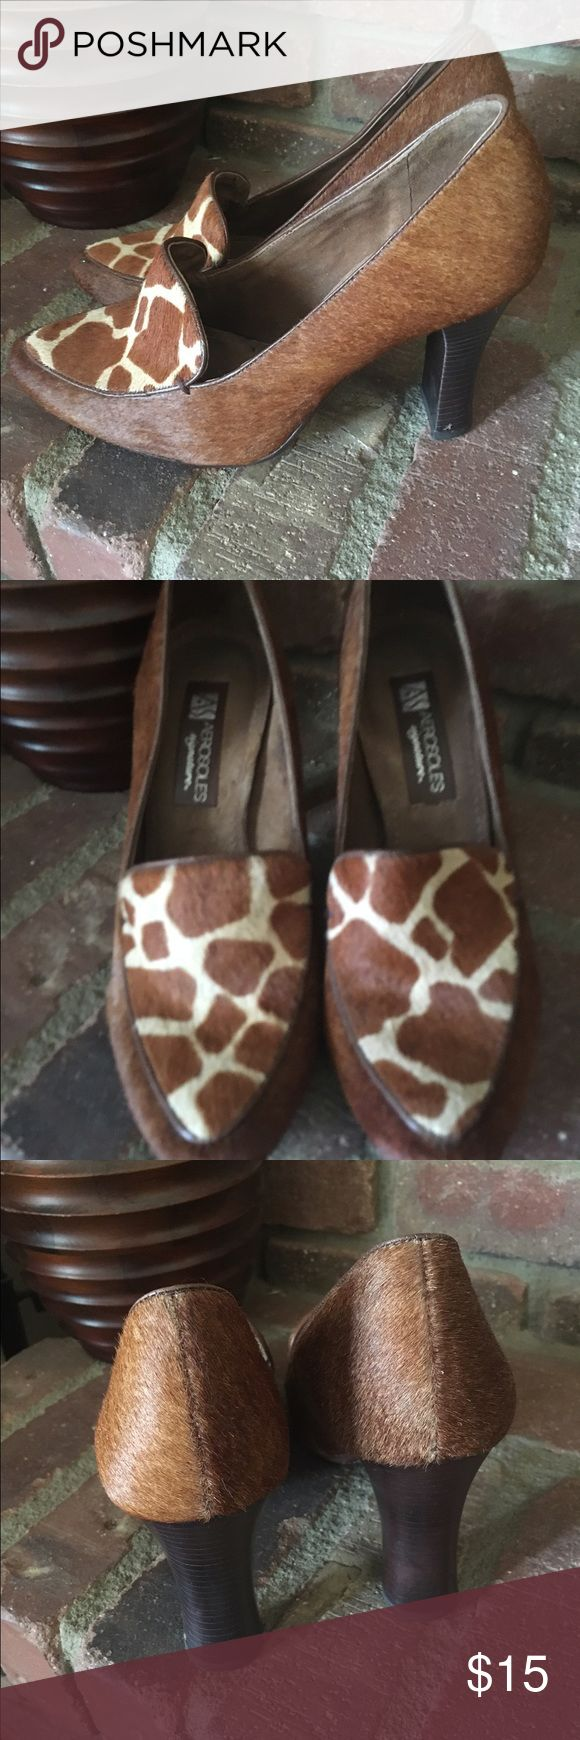 Women's Pumps Pony hair animal print Pumps.  Very comfortable great condition.  3.5 inch heel. AEROSOLES Shoes Heels